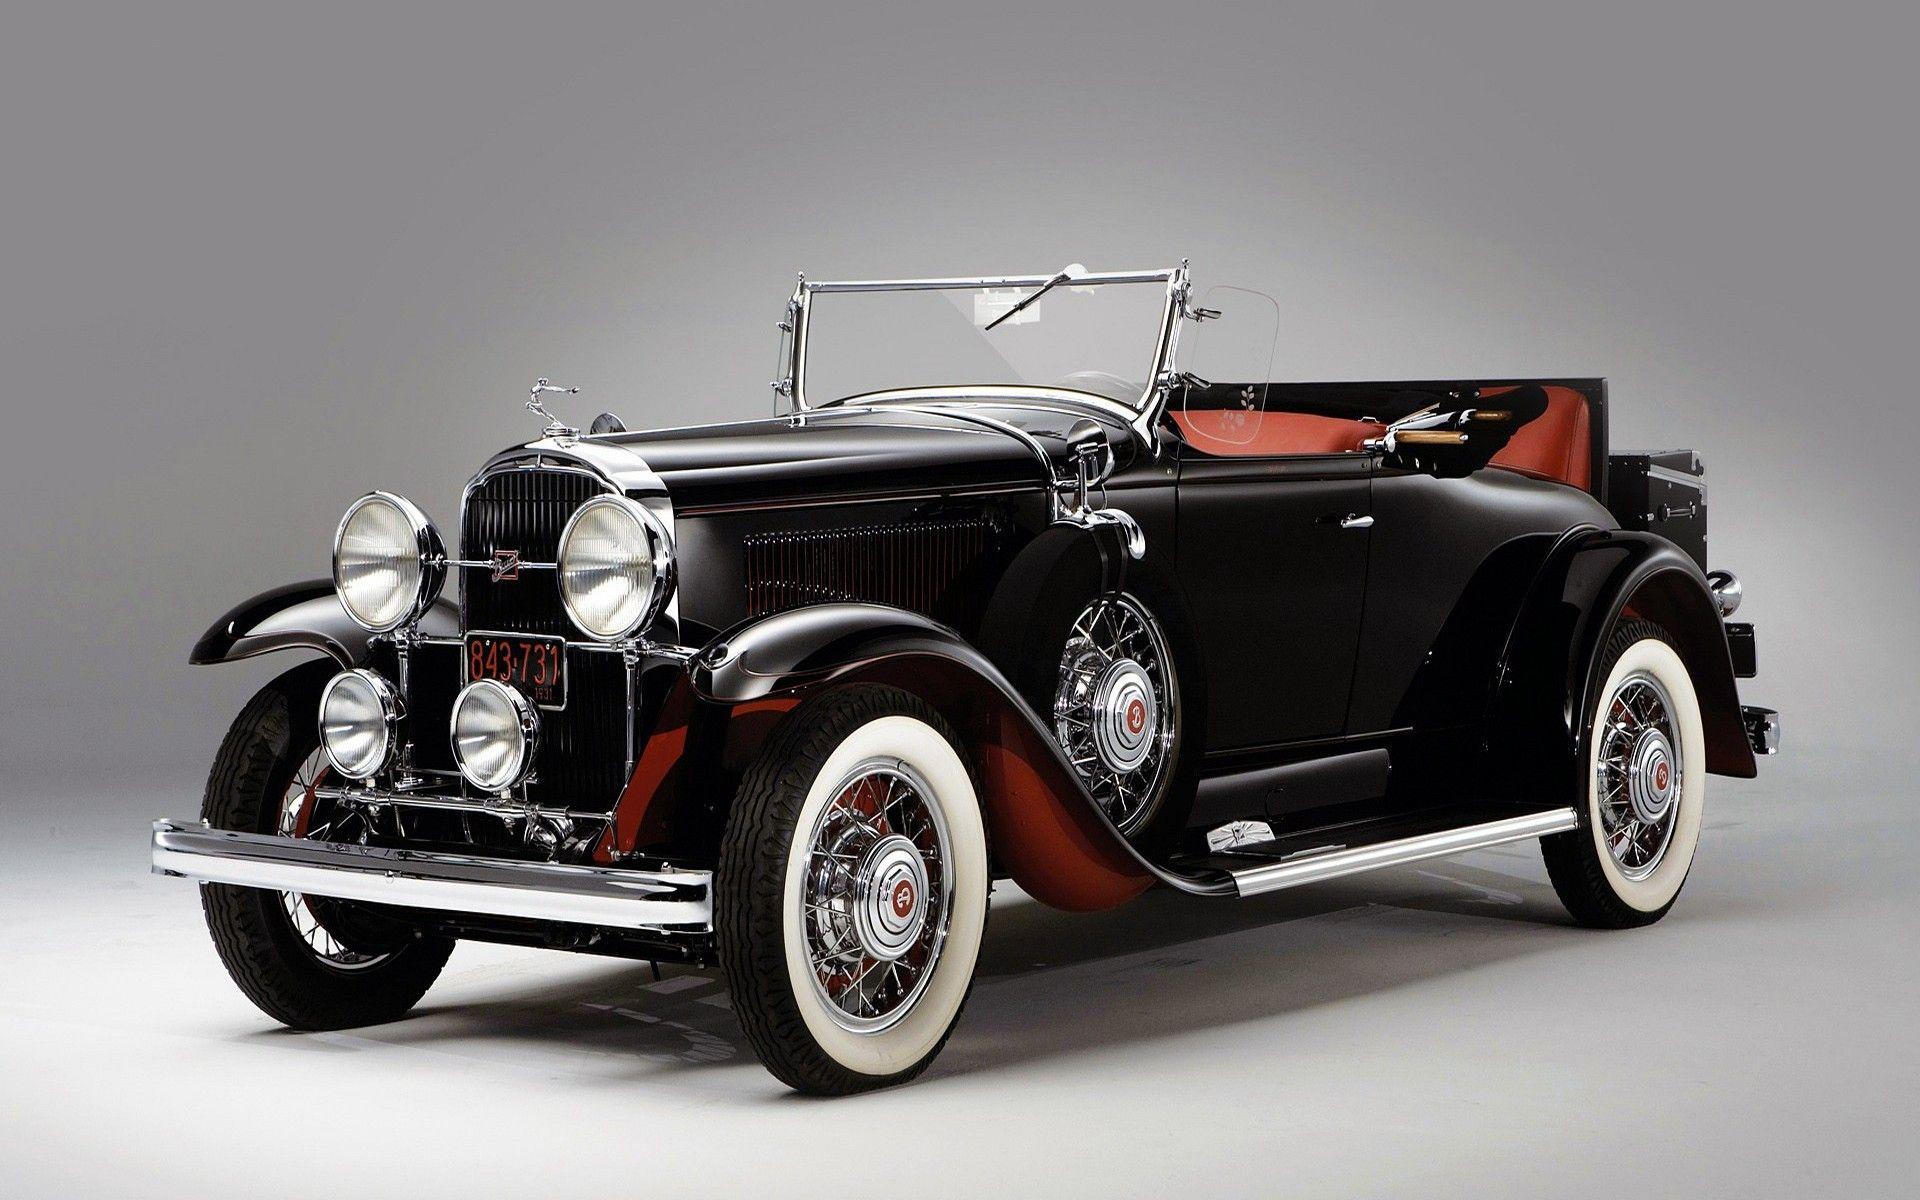 1931-buick-car-vintage-1920x1200.jpg (1920×1200) | Classic cars ...